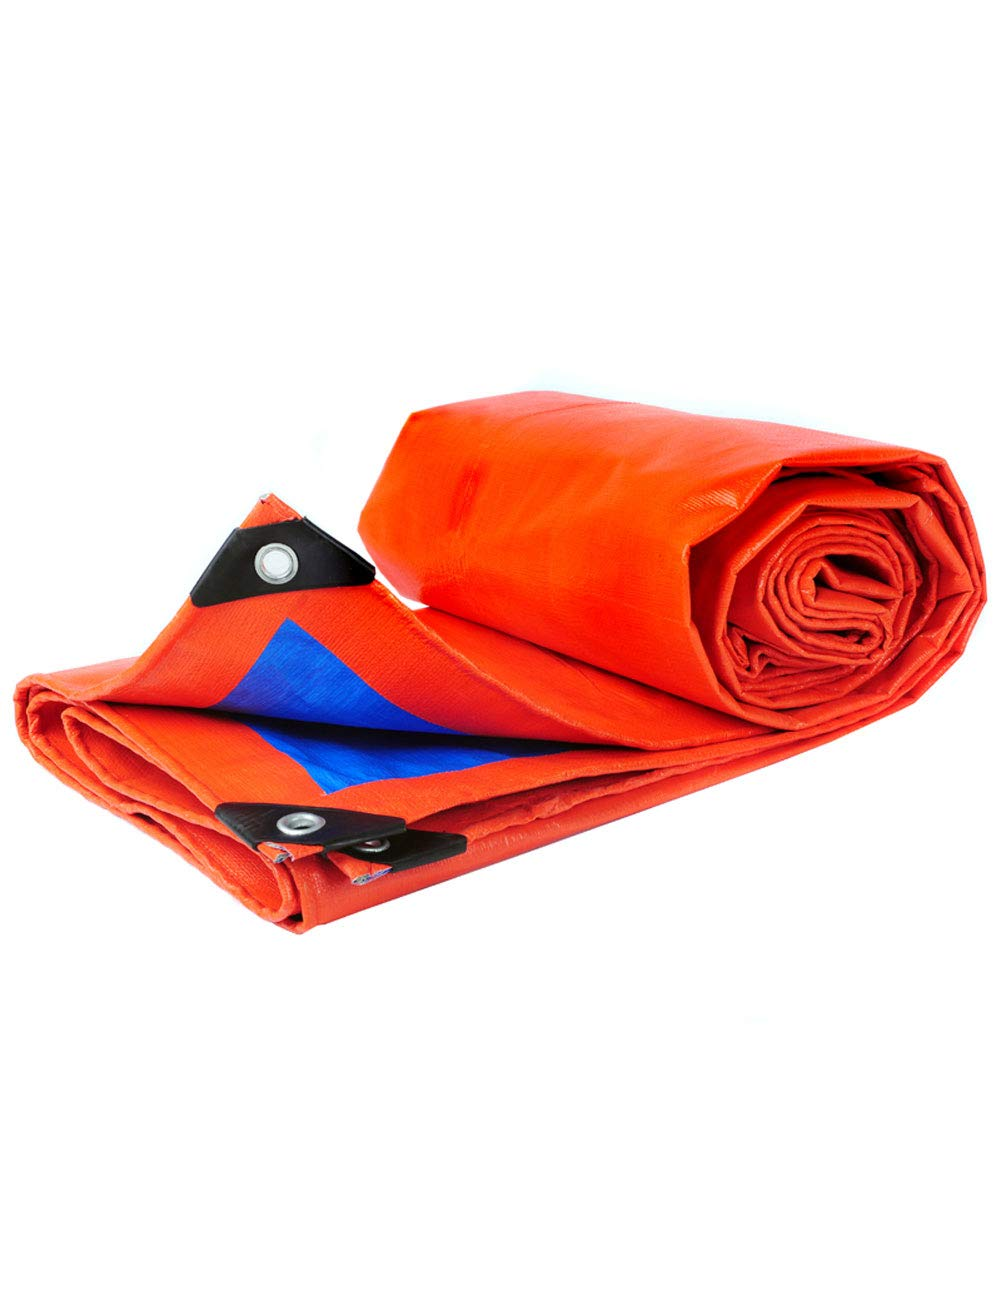 Fonly Blau Orange Verdicken Plane Heavy Duty wasserdicht Tarp Zelt Camping Schatten Tarp